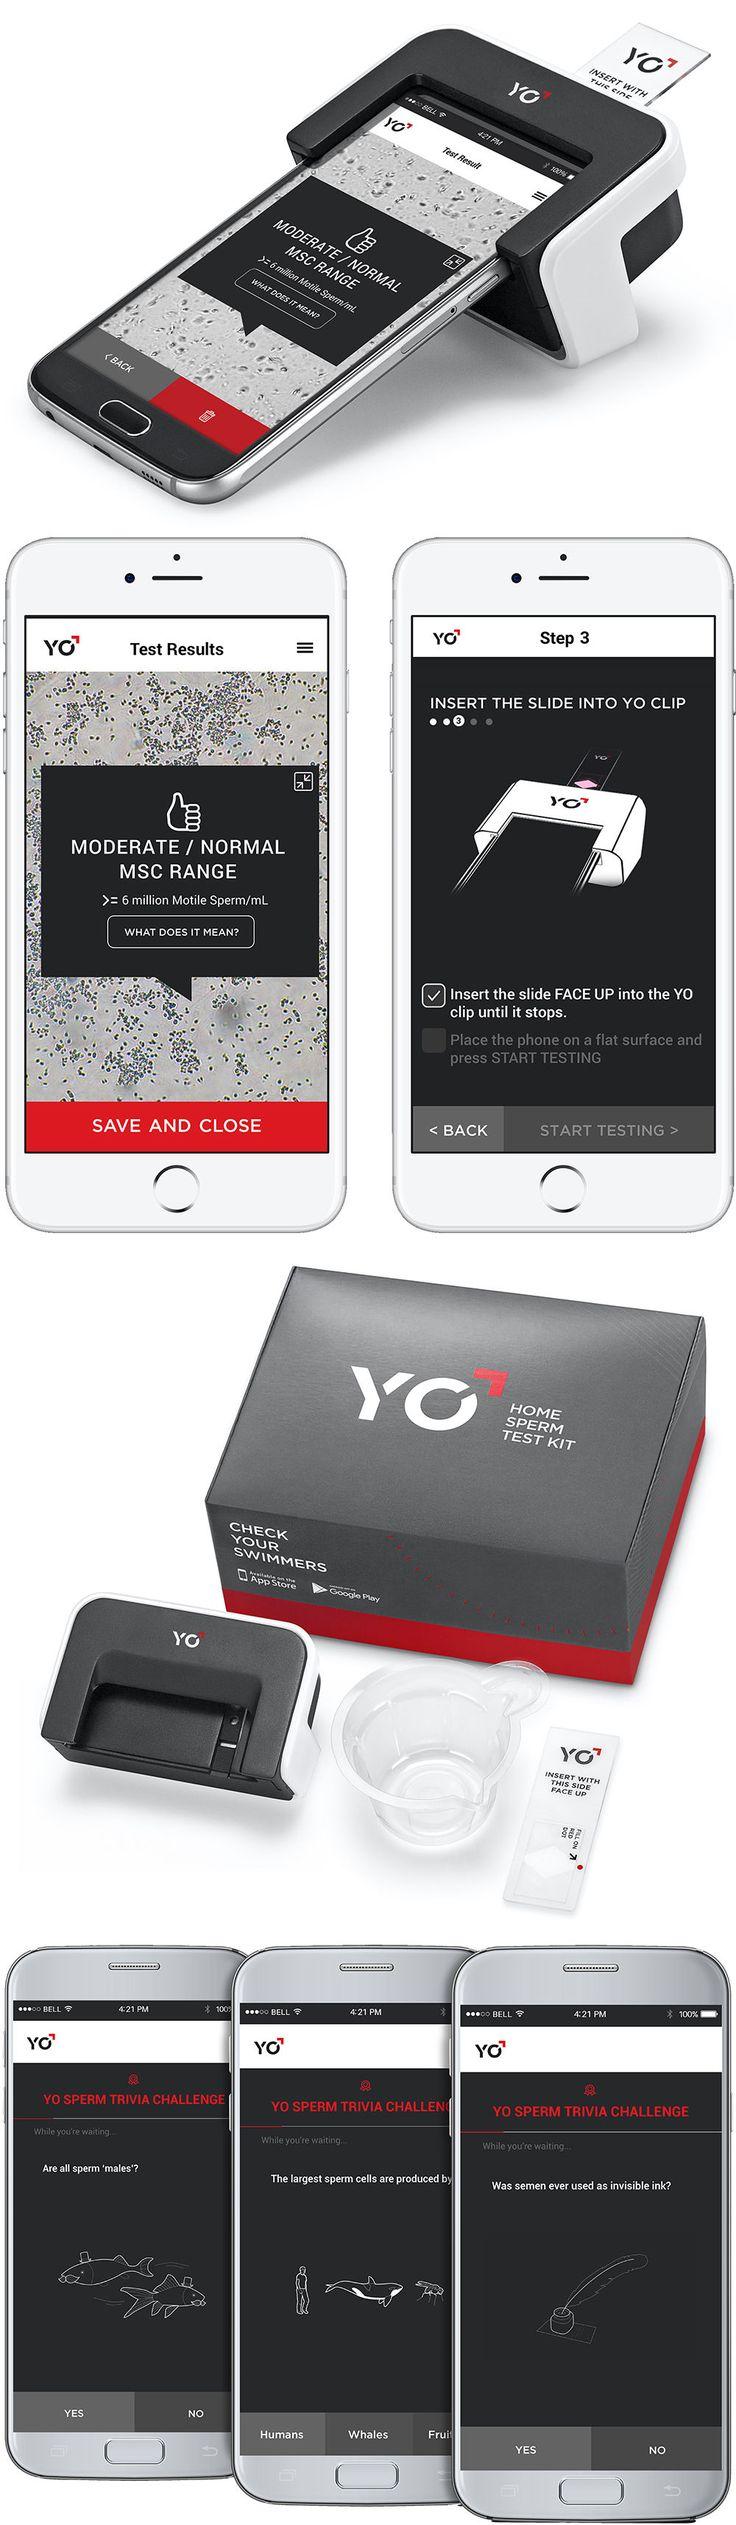 Pregnancy Tests: Yo At Home Motile Sperm Test For Galaxy S6   Male Fertility Test Semen Analysis -> BUY IT NOW ONLY: $49.95 on eBay!